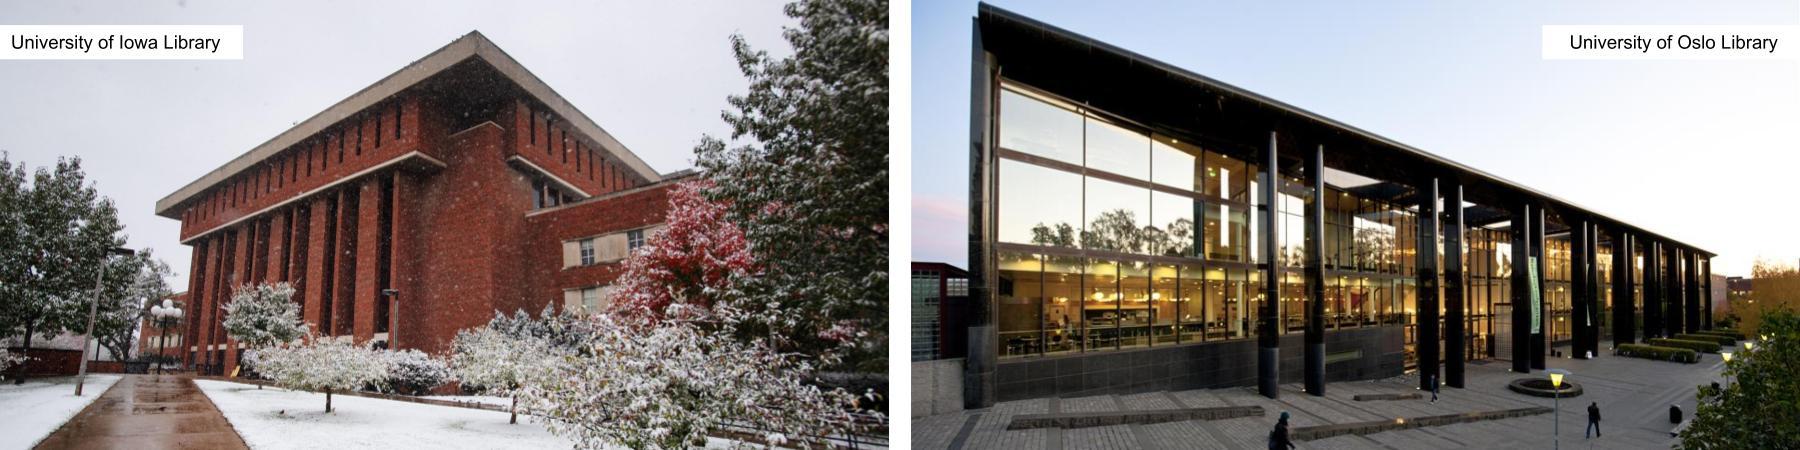 University of Iowa and University of Oslo Libraries